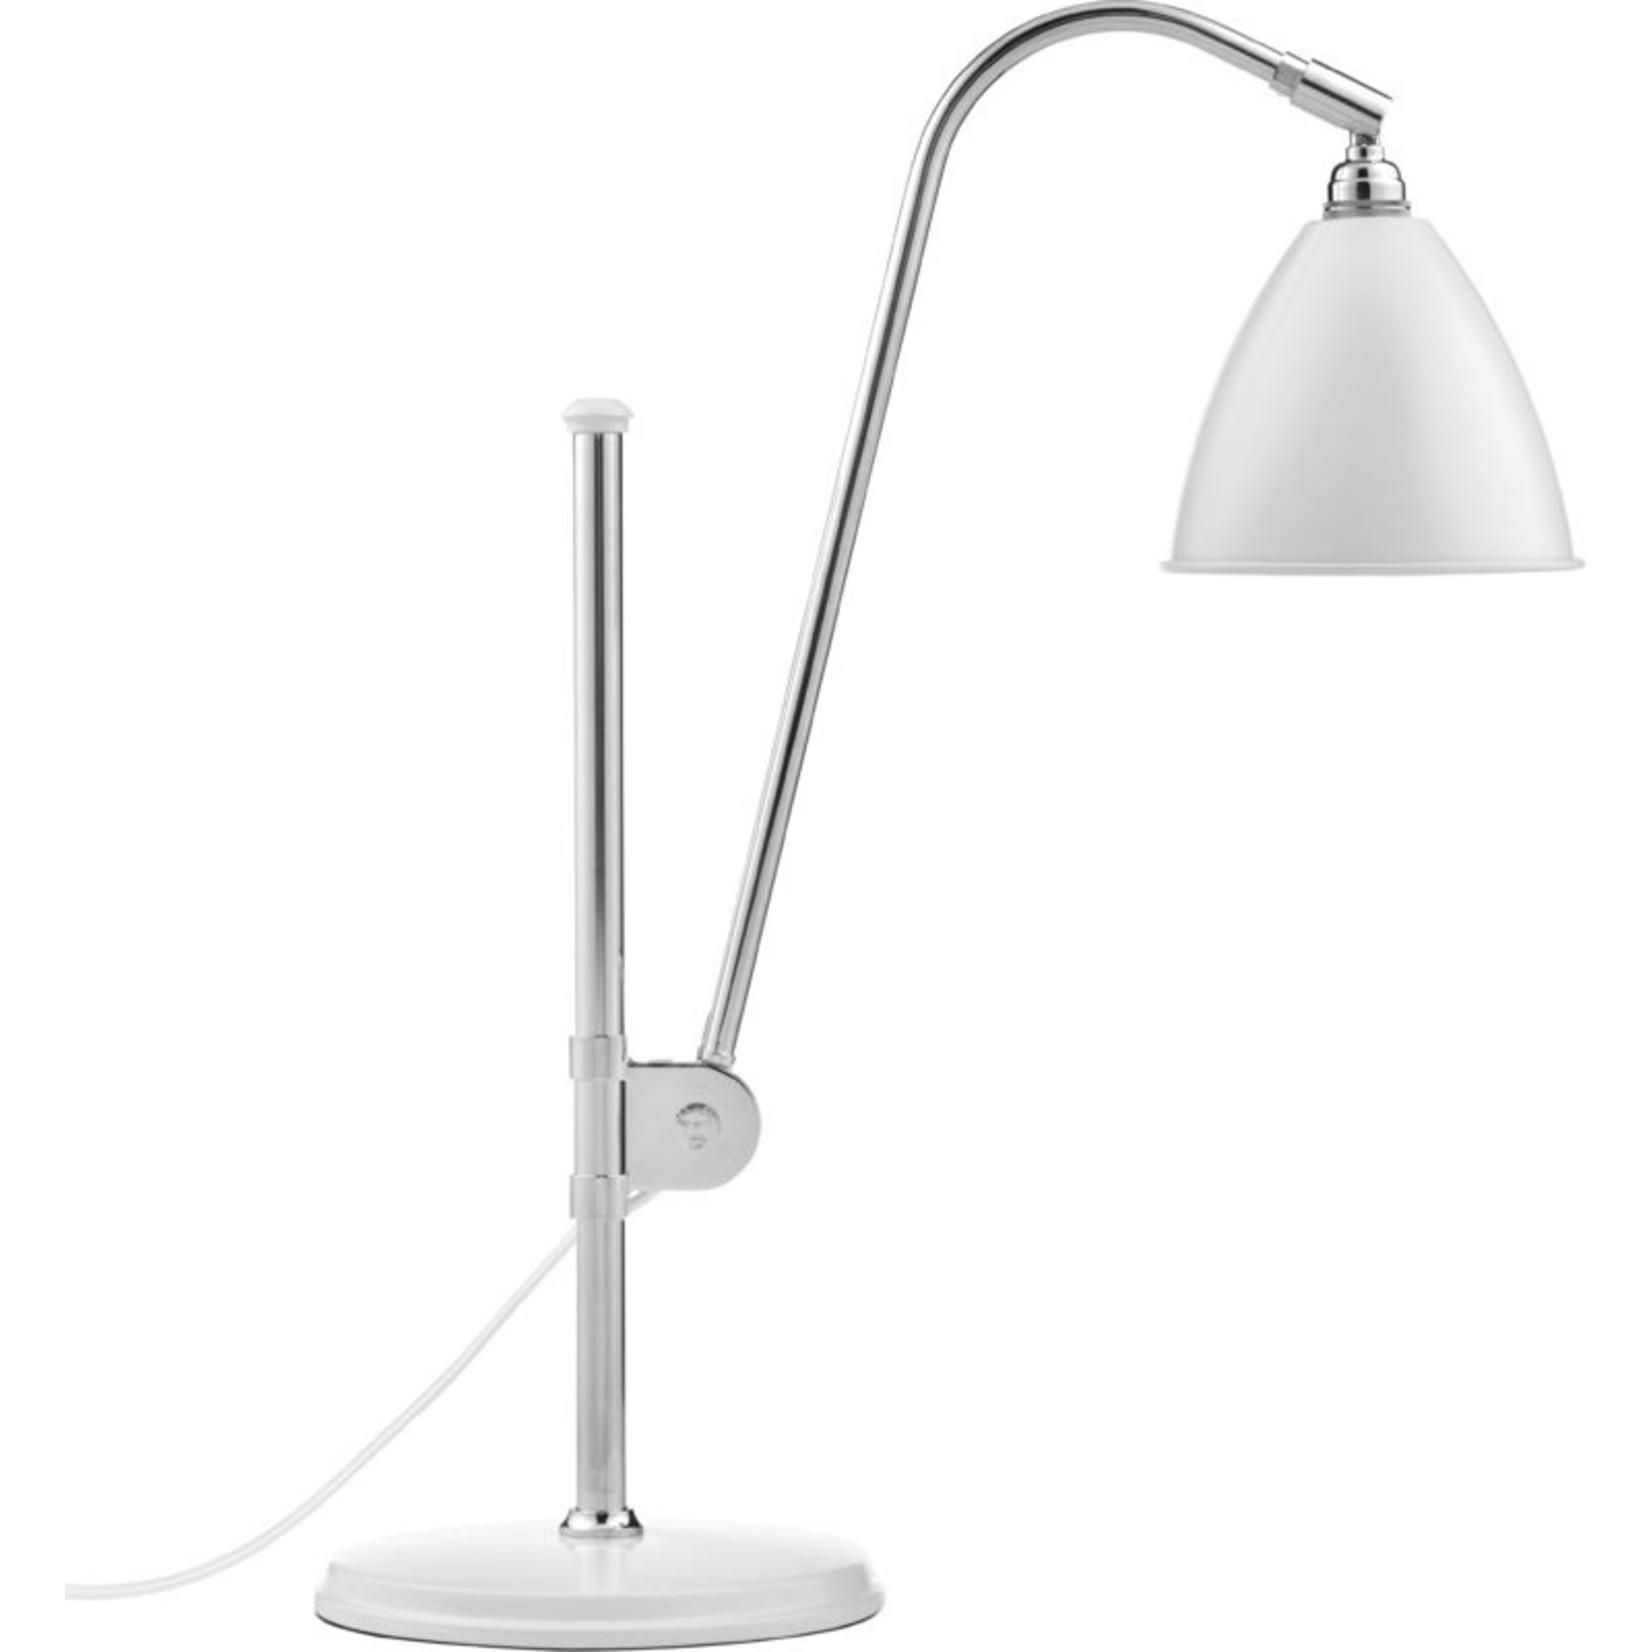 Gubi BL1 Table Lamp - Ø16 | Chrome Base & Soft White Semi Matt Shade